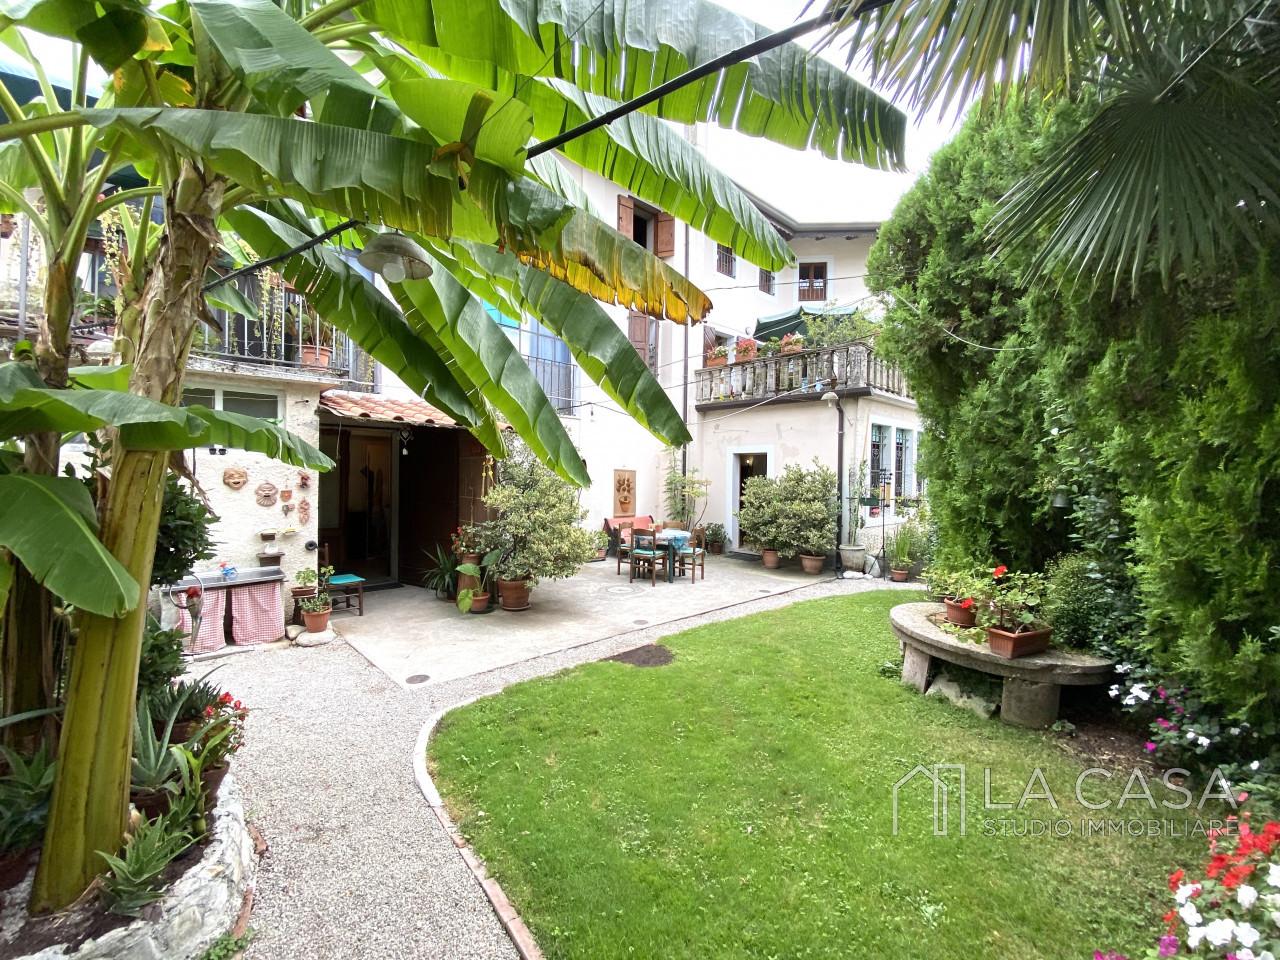 Palazzo plurifamiliare in vendita a Valvasone Arzene - Rif. P3 https://images.gestionaleimmobiliare.it/foto/annunci/200827/2284141/1280x1280/024__img_3736_wmk_0.jpg